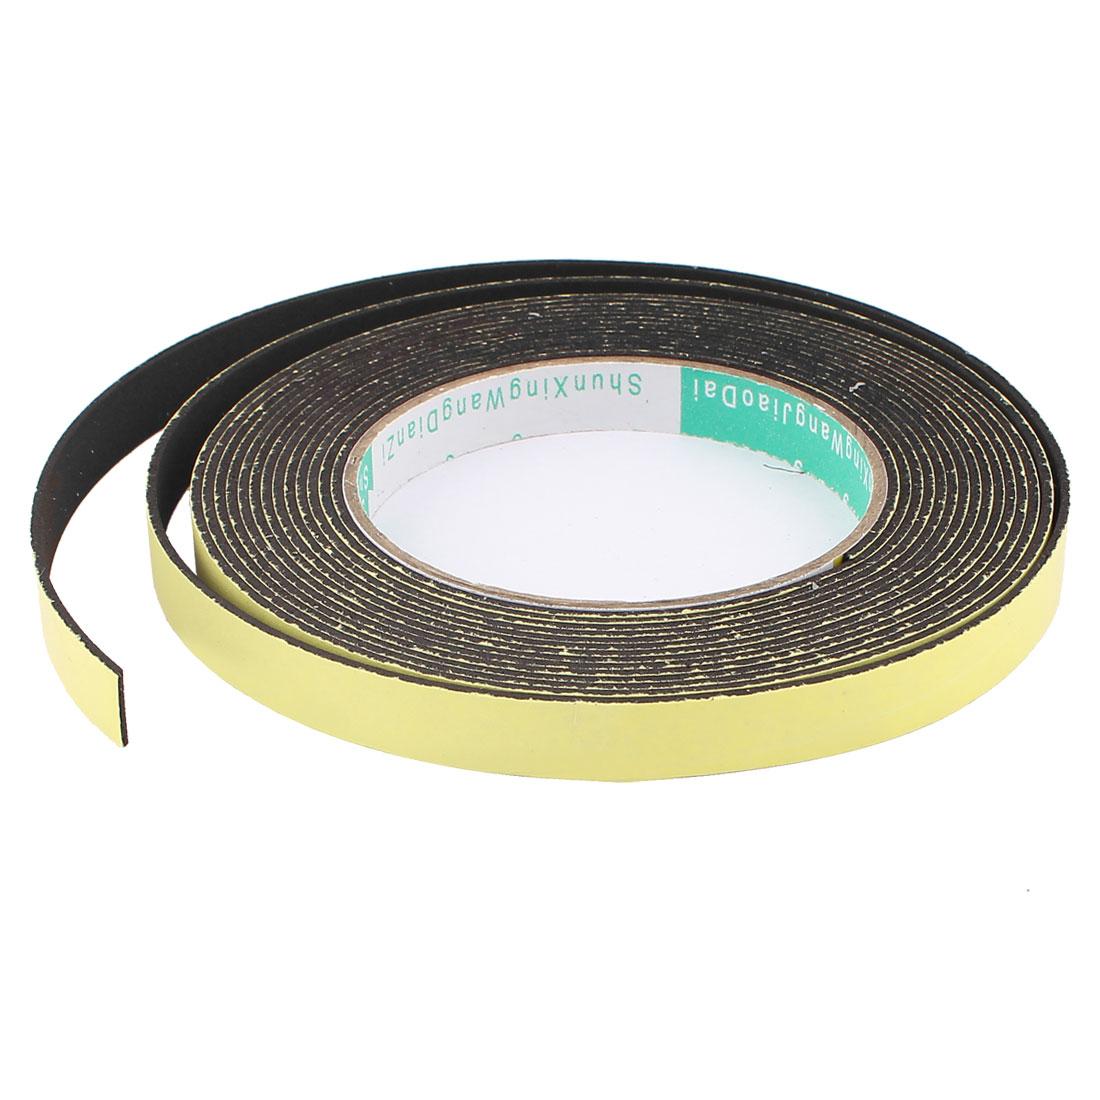 5M 12mm x 1.5mm Single Side Adhesive Foam Sealing Tape for Door Window - image 3 of 3